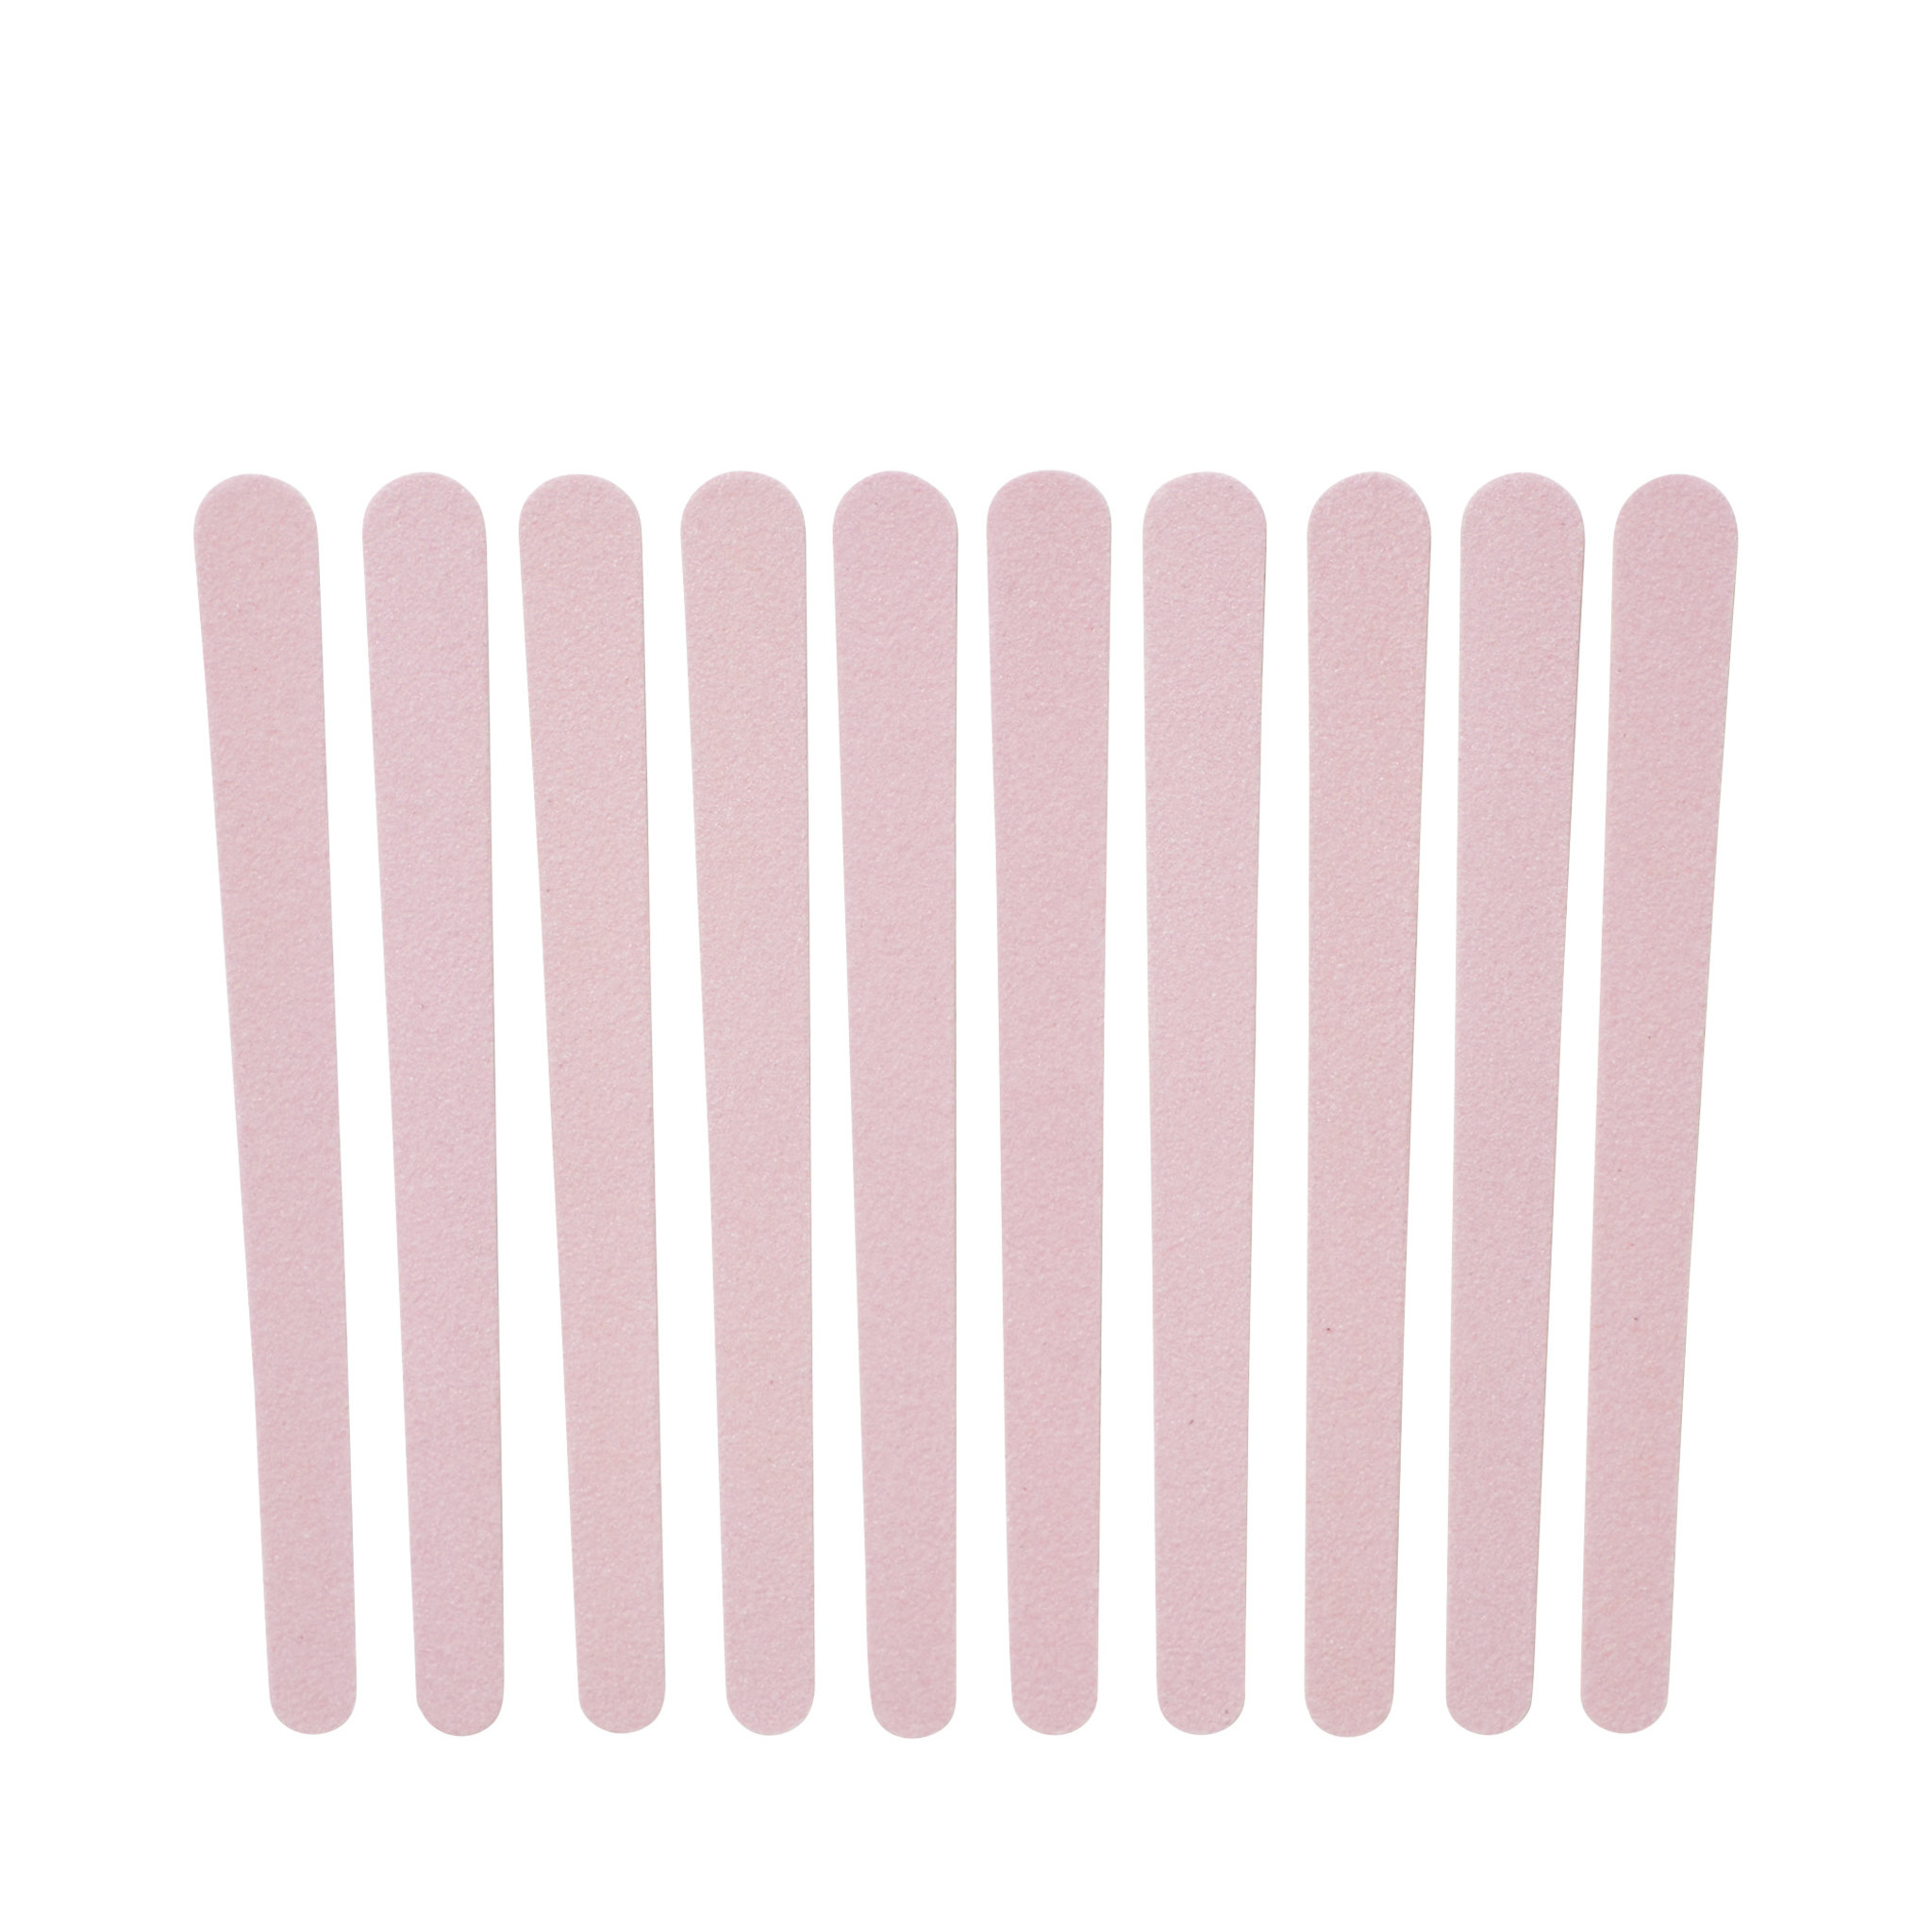 Sandpappersfil 10-pack, fin/medium